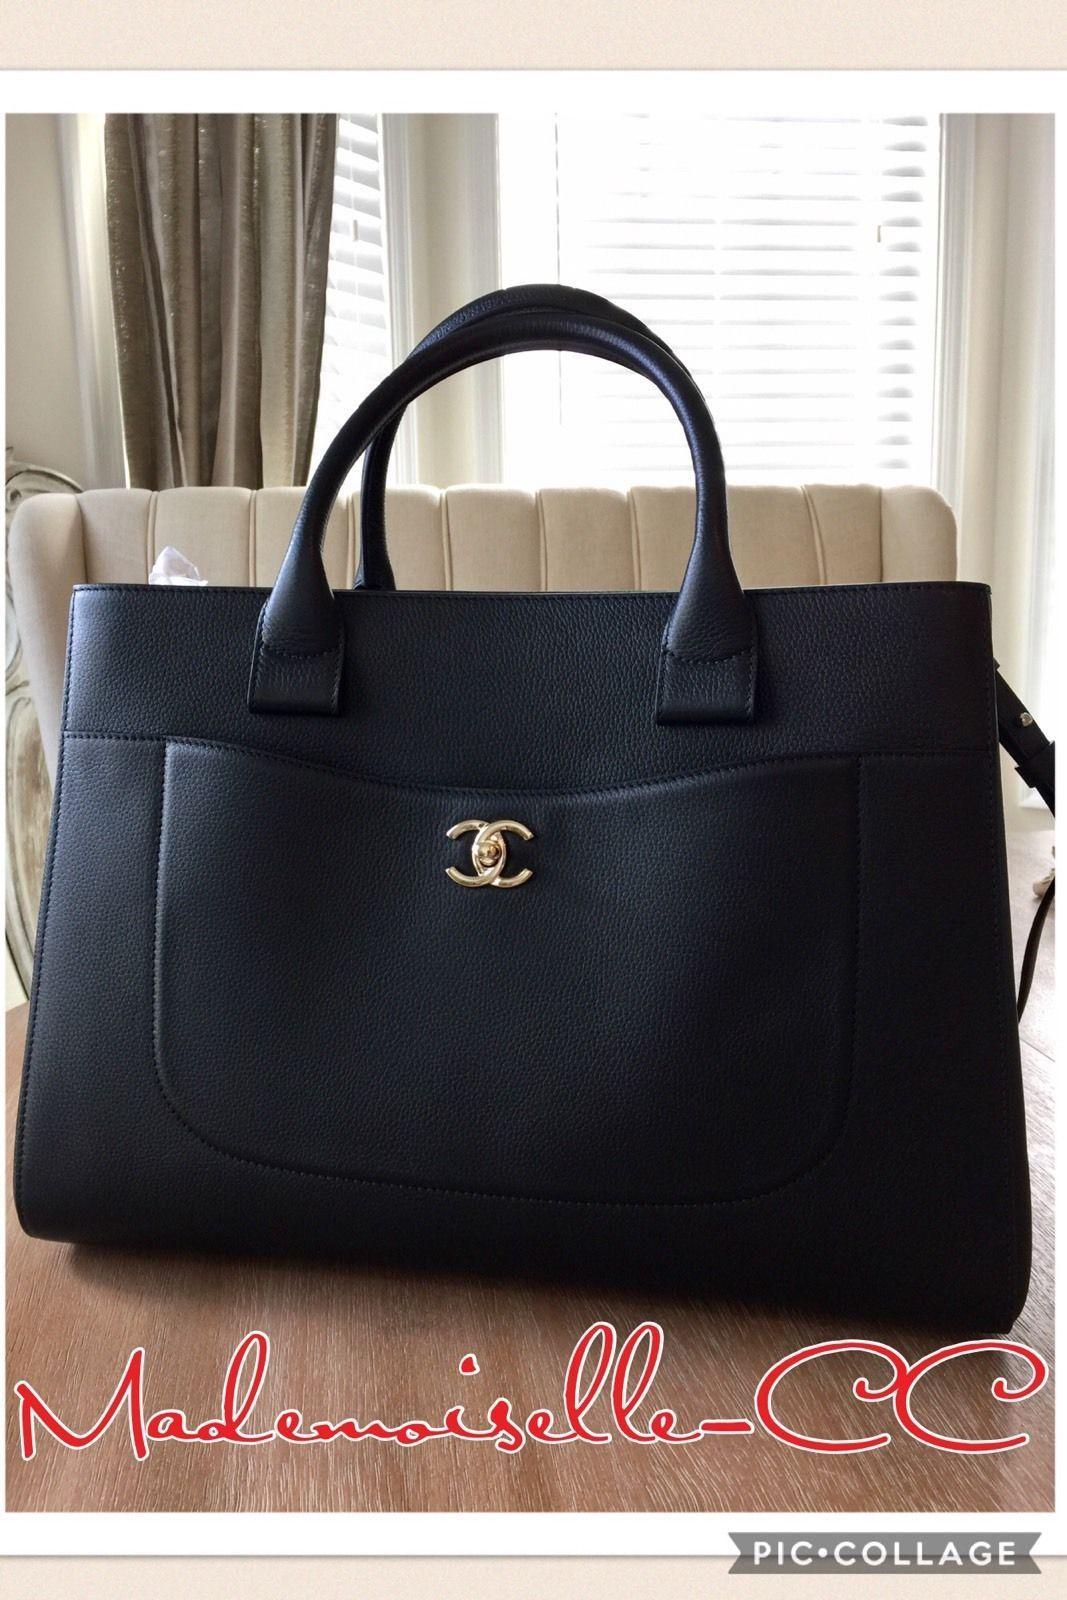 3989054f1d05 Chanel Black Executive Bag Shopping Tote Shoulder Bag Brand New 2017 Caviar  $5000.0